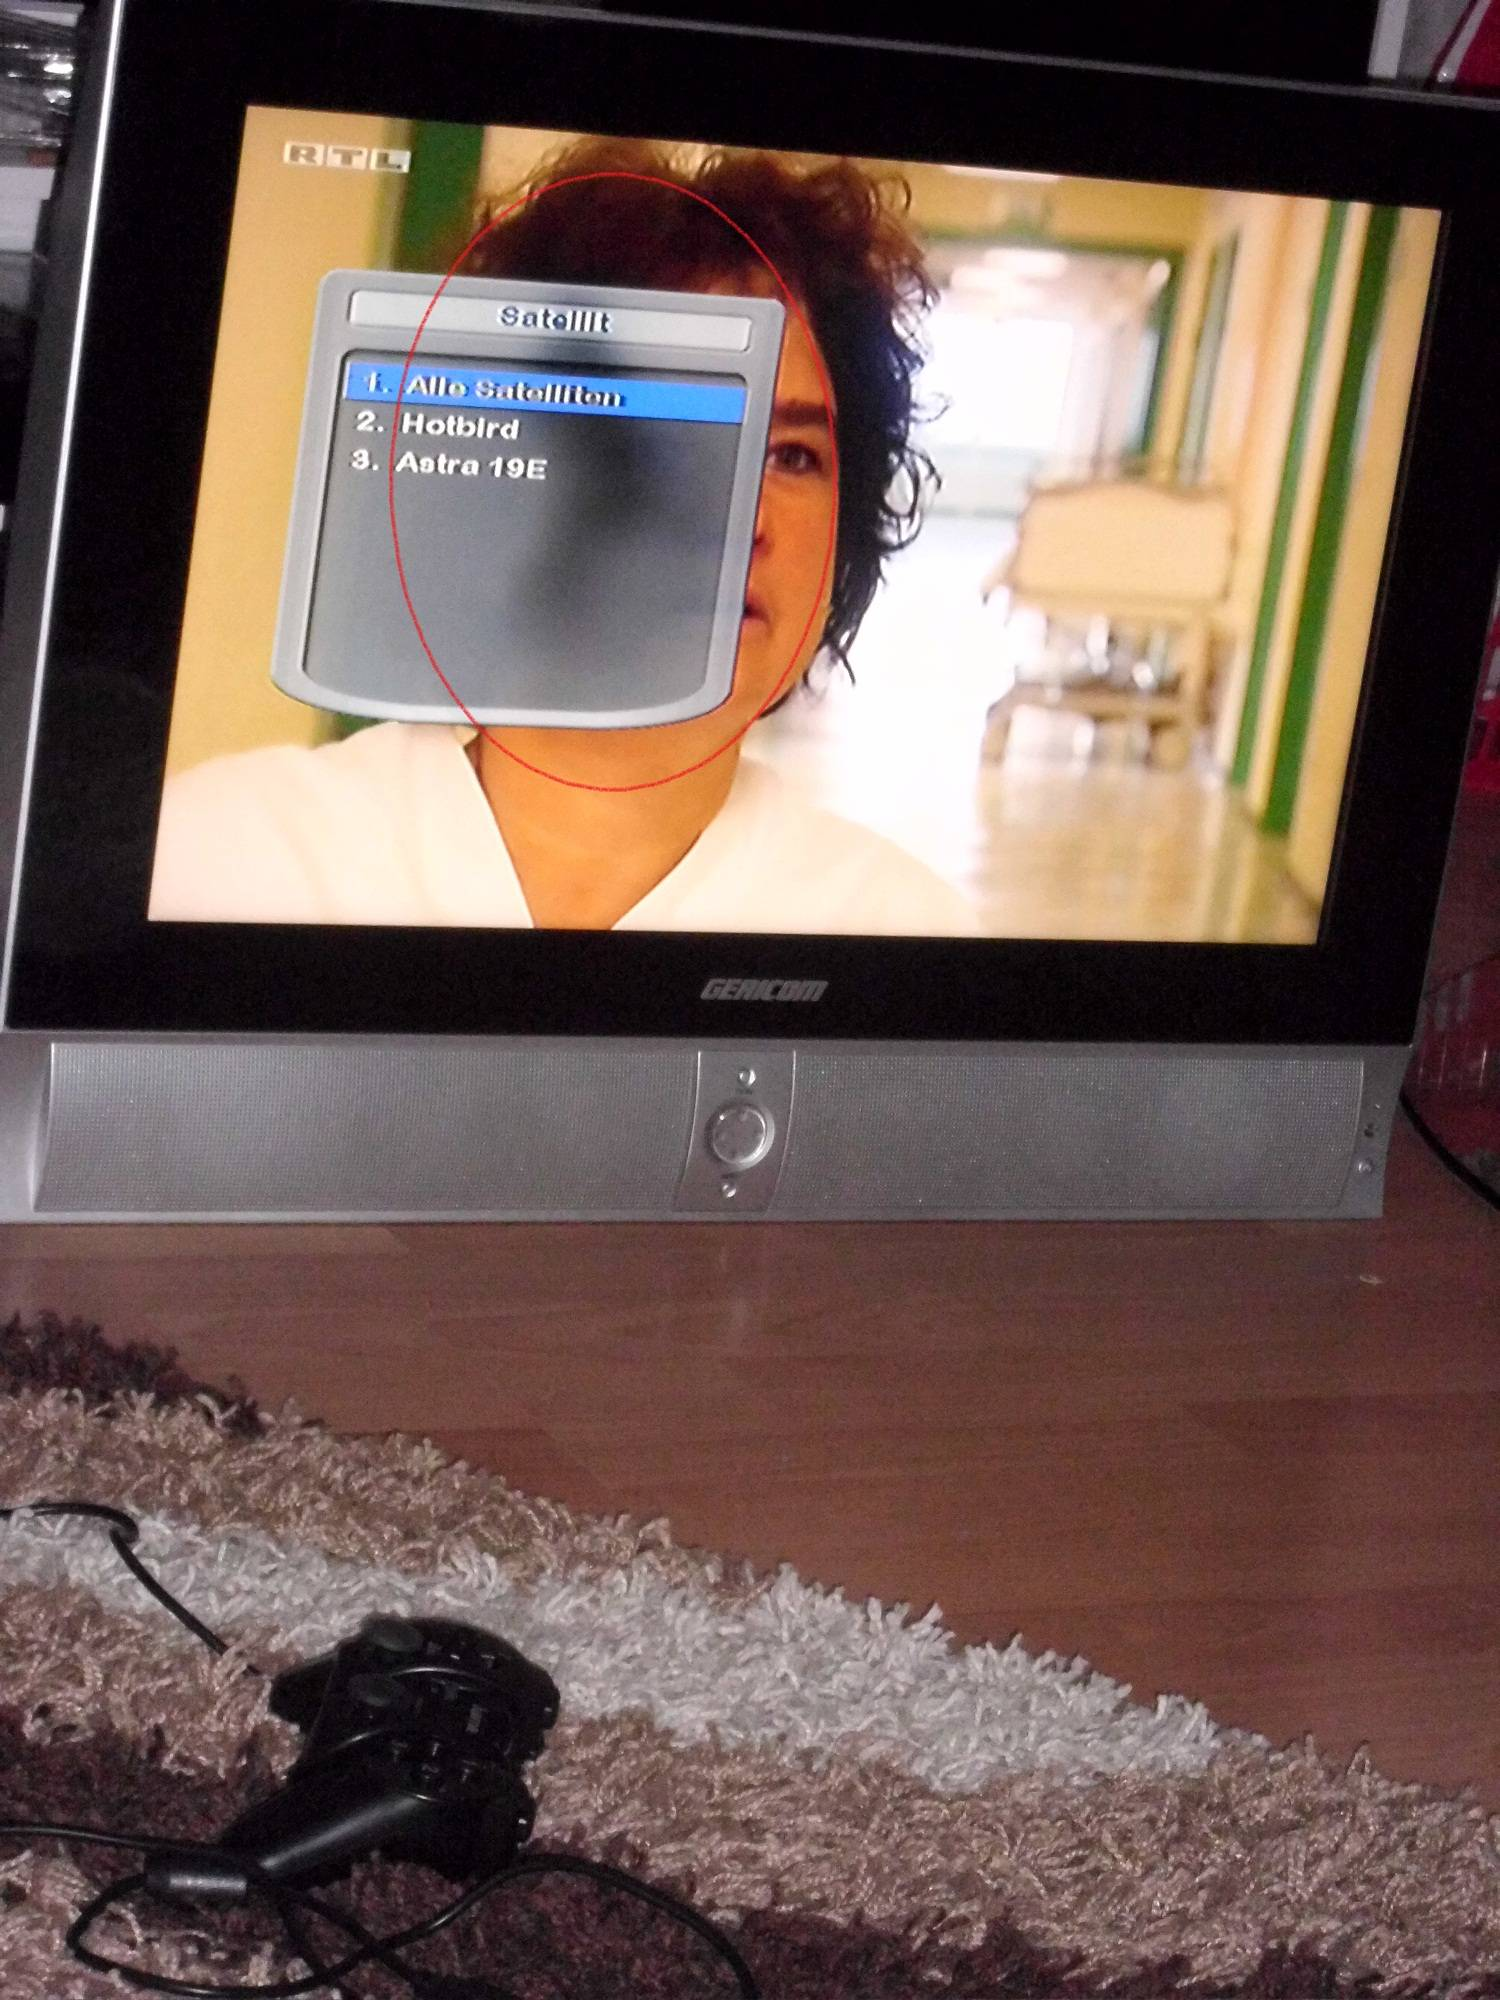 lcd tv gericom gtv 2610 schwarzer fleck auf bildschirm. Black Bedroom Furniture Sets. Home Design Ideas